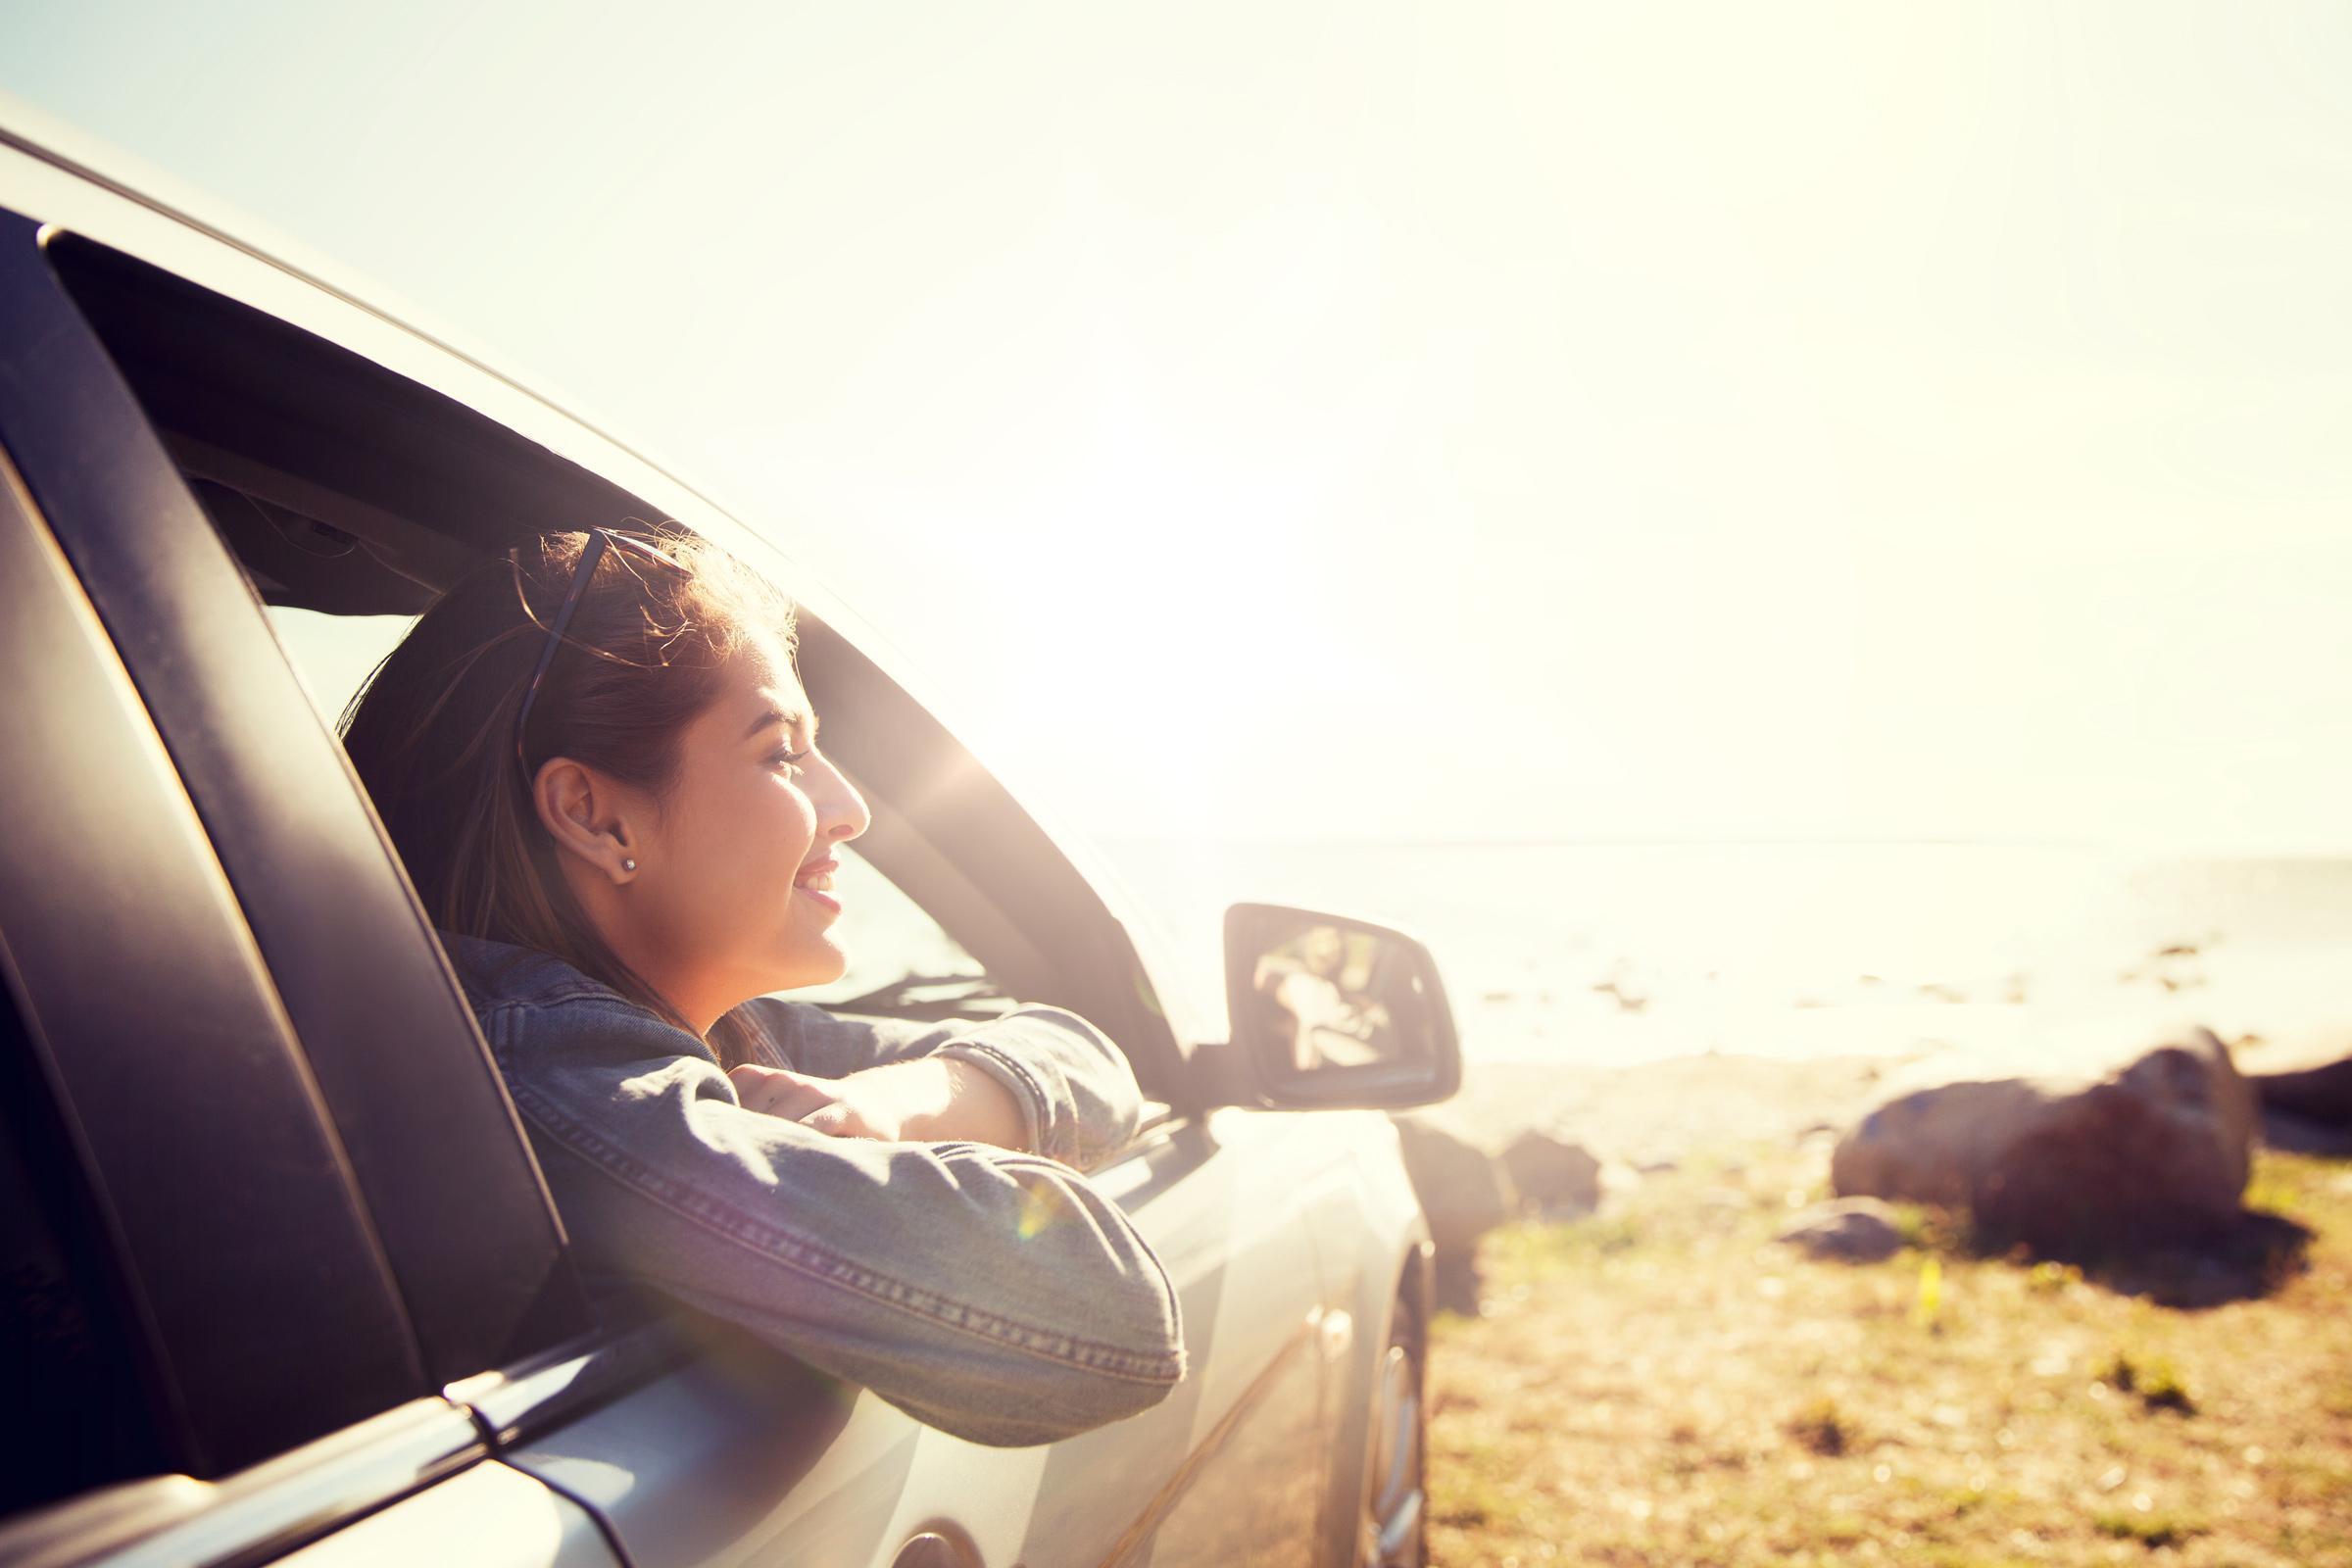 Happy woman inside a car